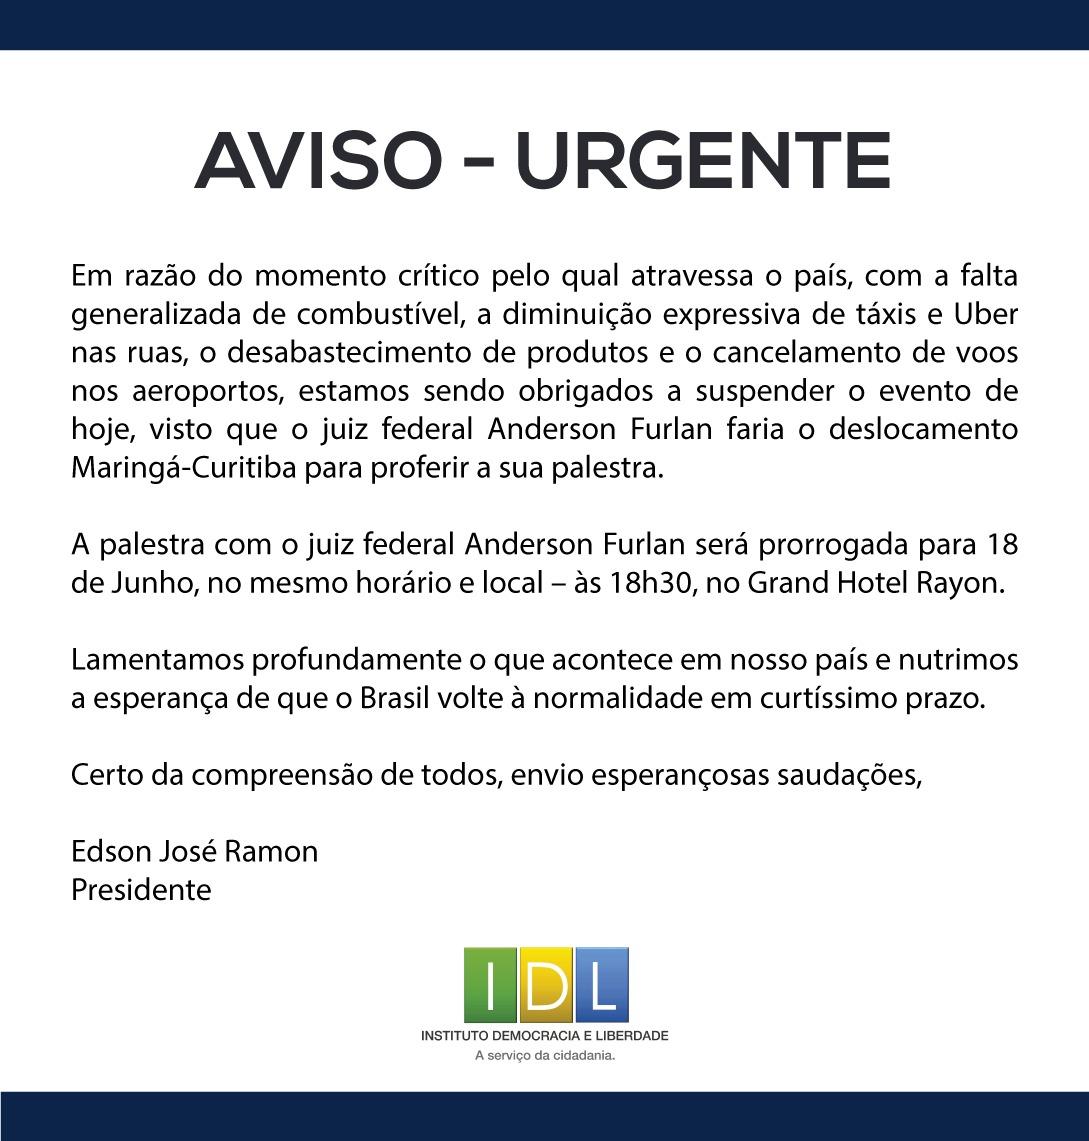 AVISO (2)